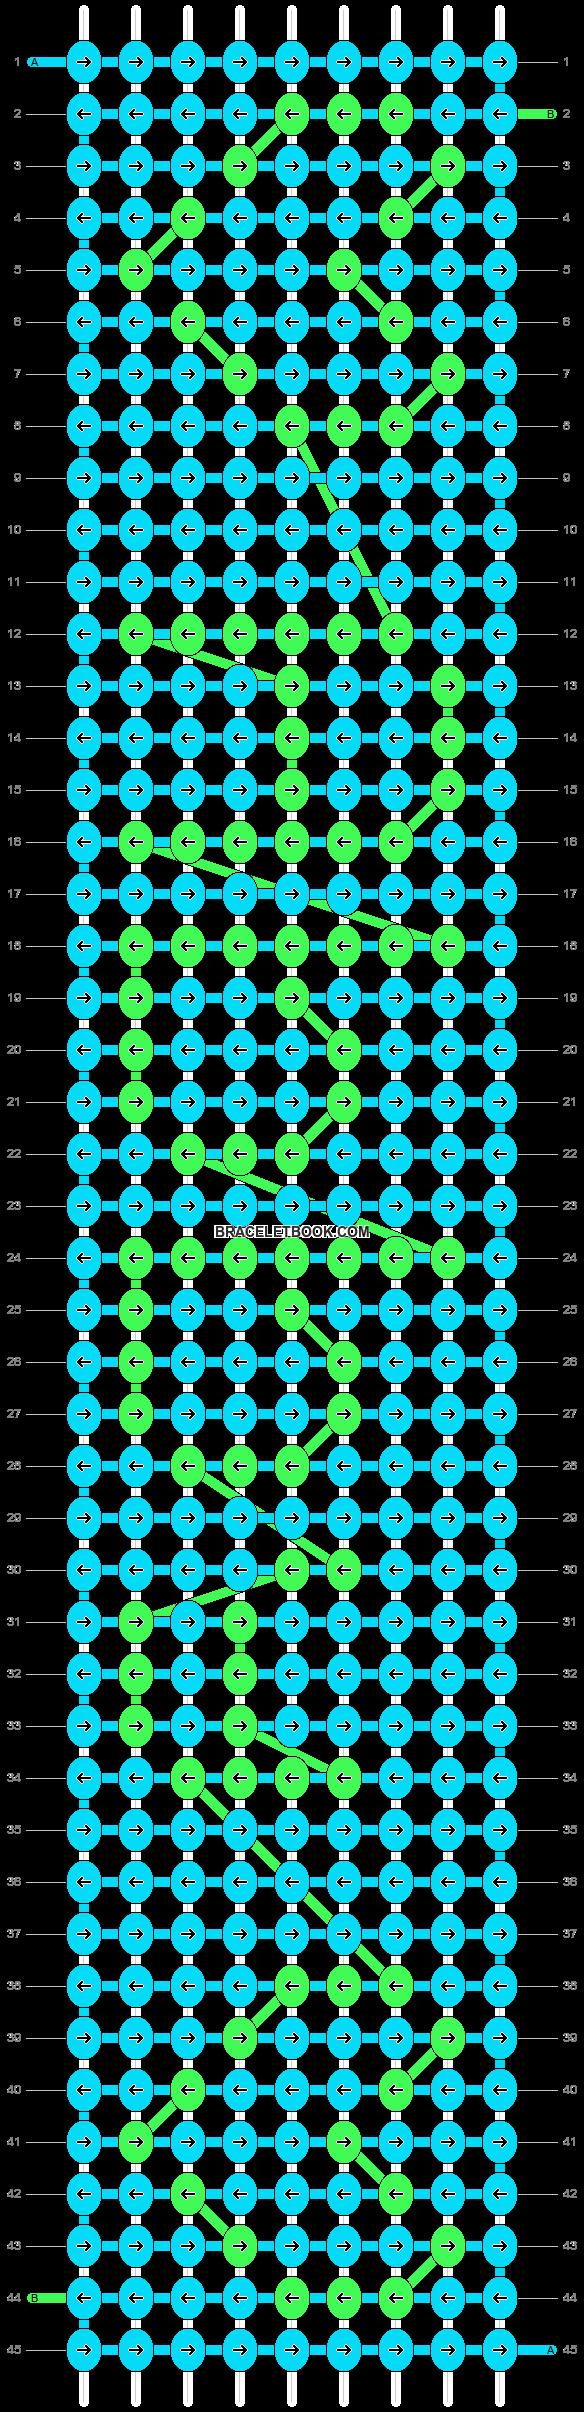 Alpha pattern #6067 pattern